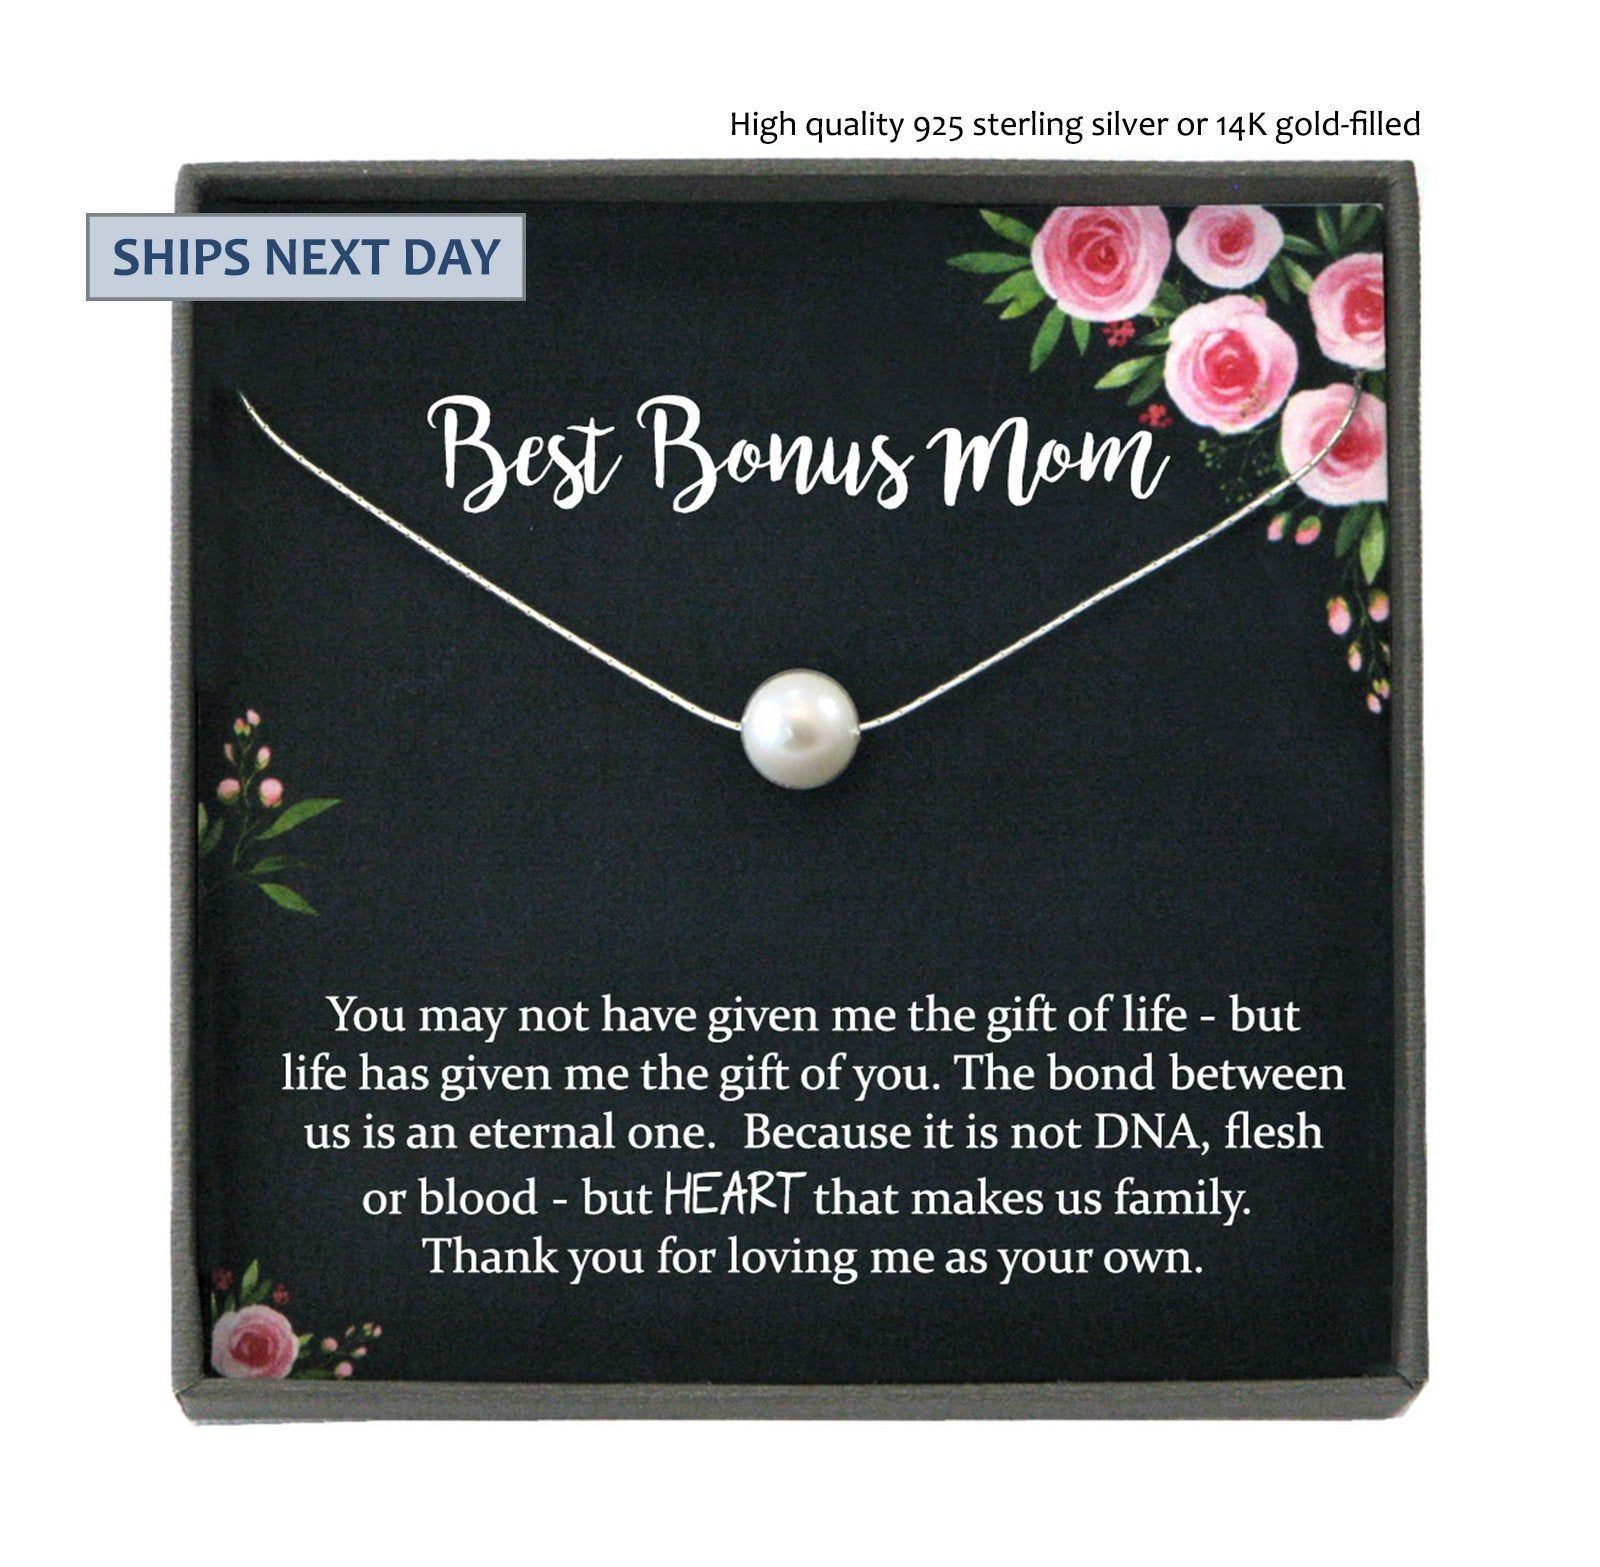 Bonus mom gift for step mother gift from bride step mom